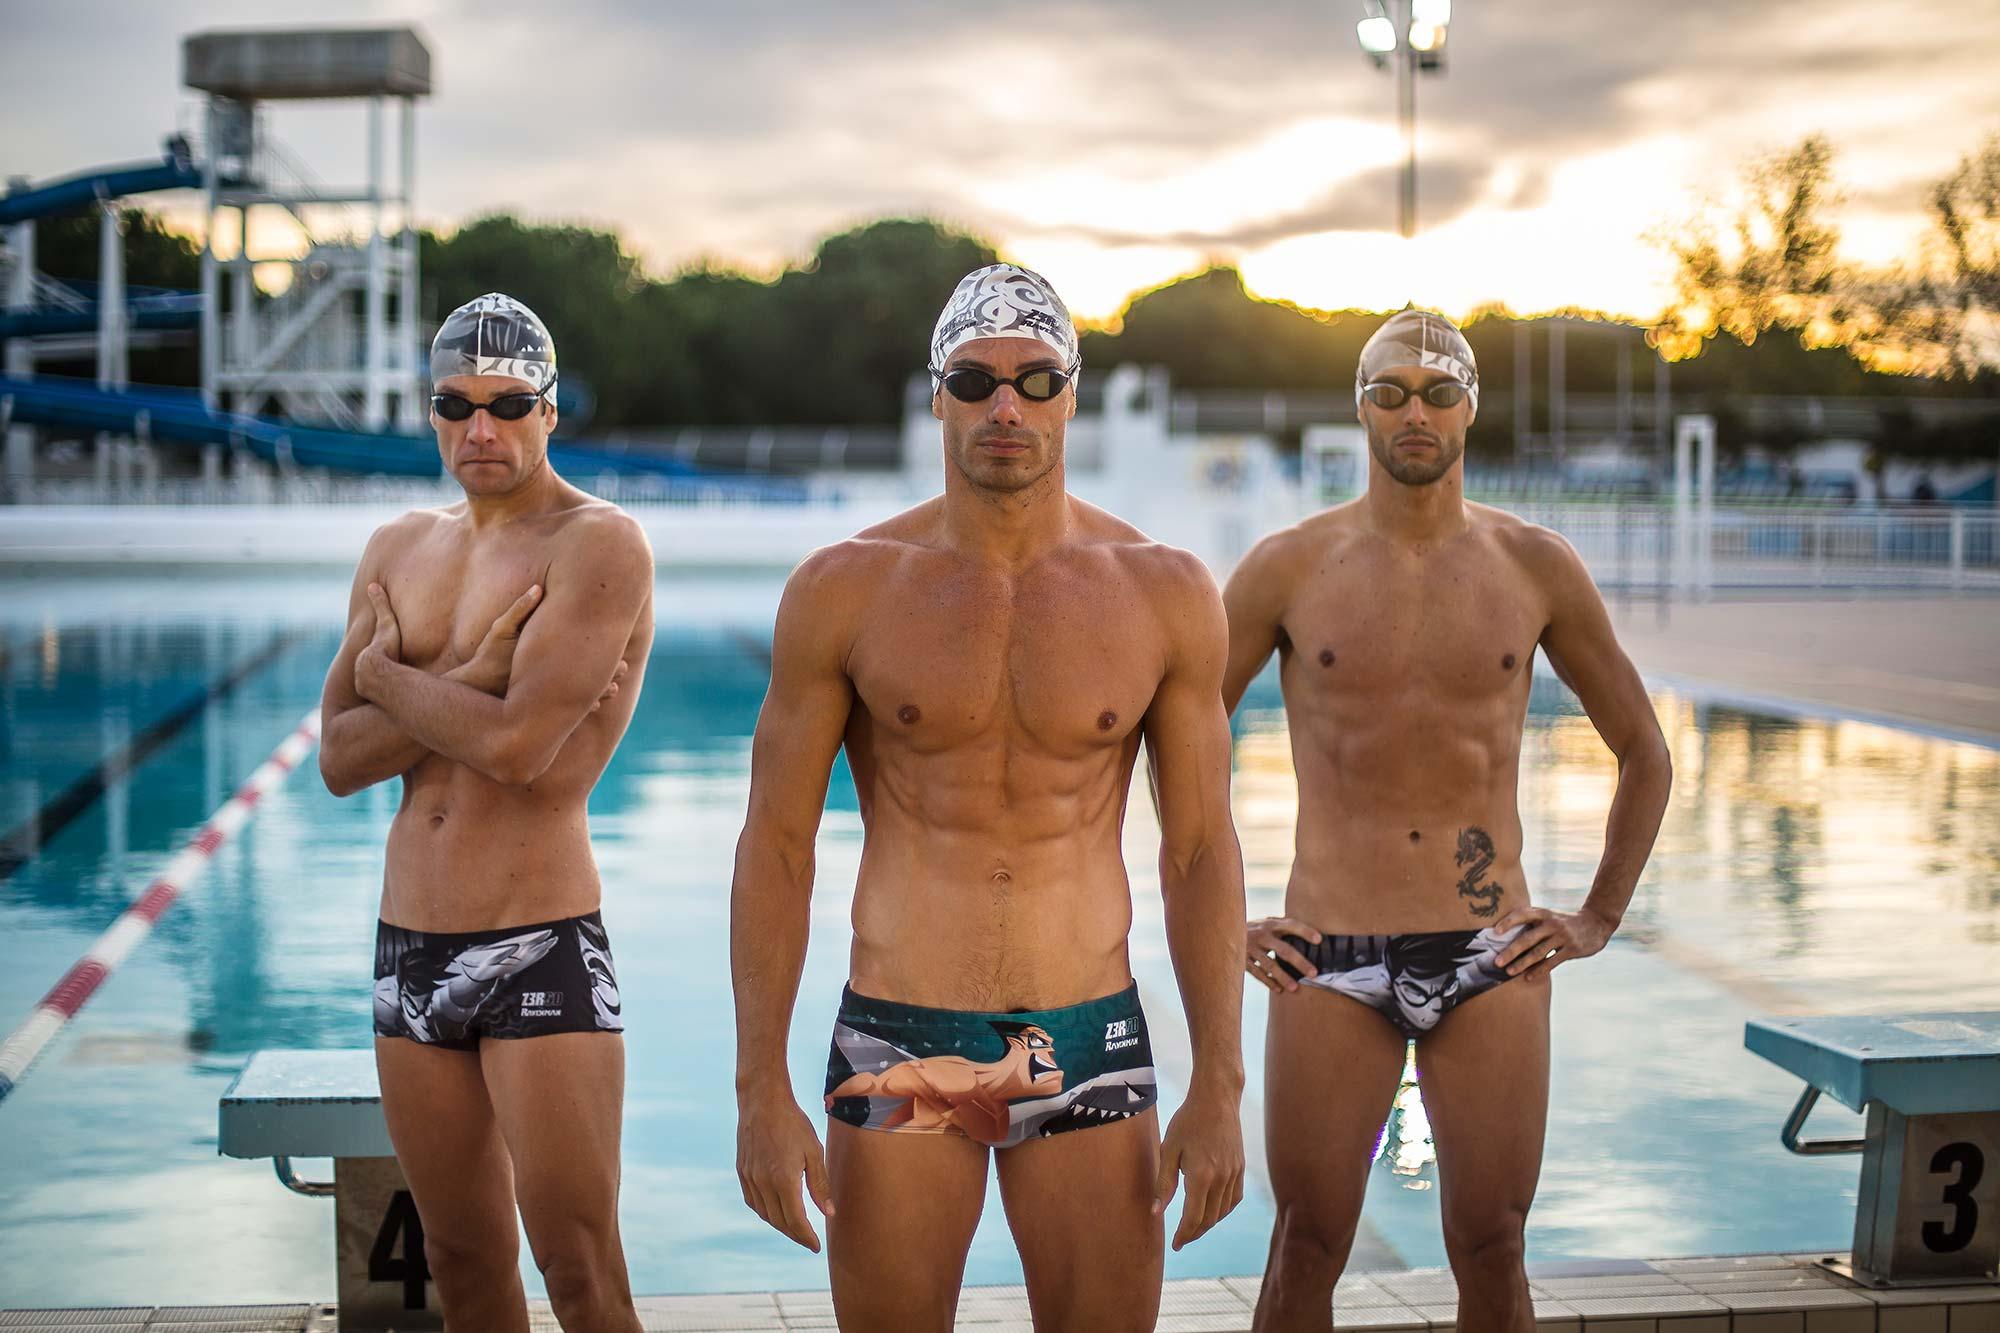 Swimming - Homme - Capsule Ravenman